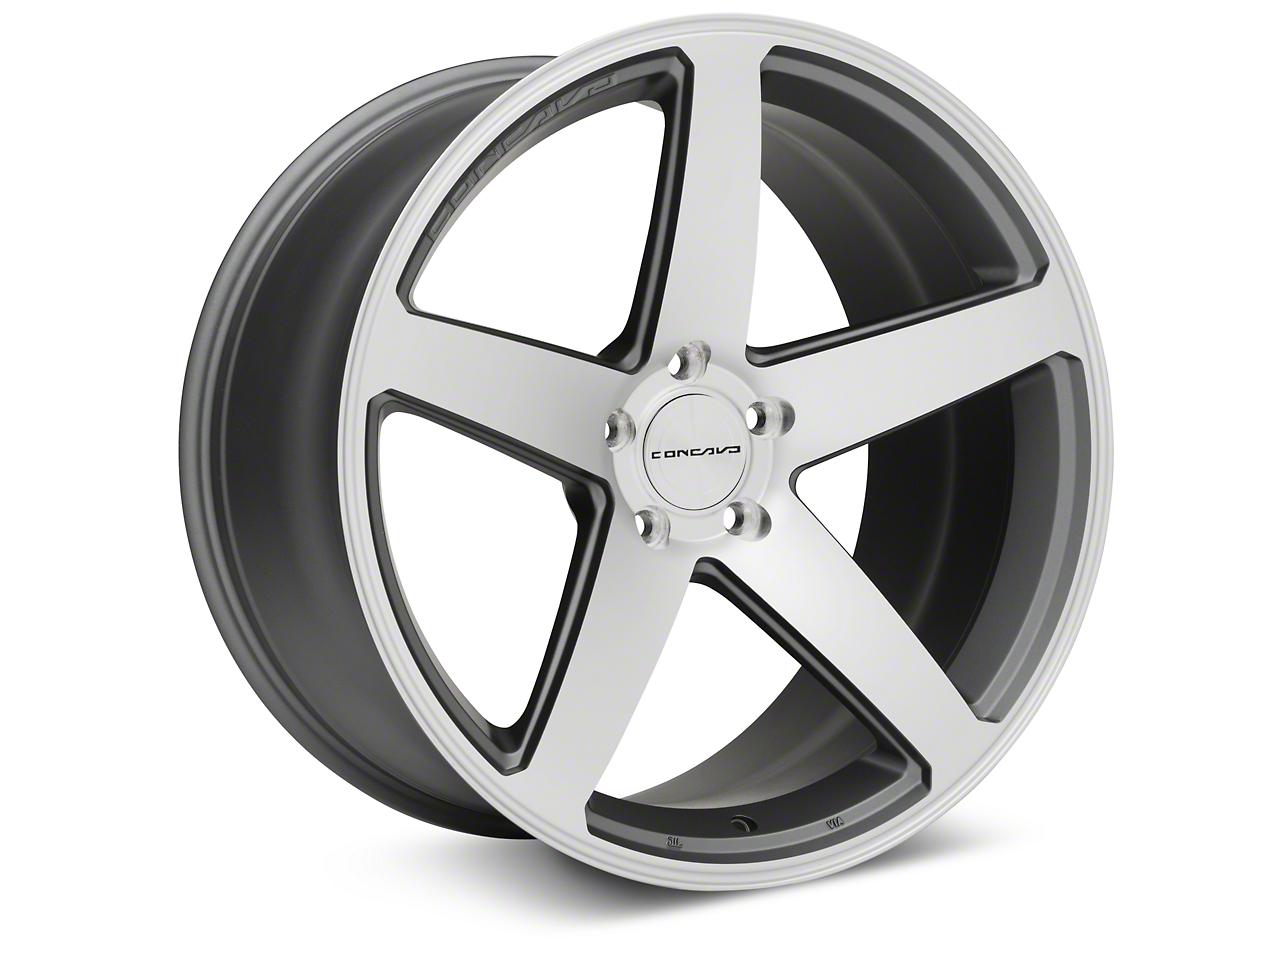 Concavo CW-5 Matte Gray Machined Wheel - 20x10.5 (05-14 All)